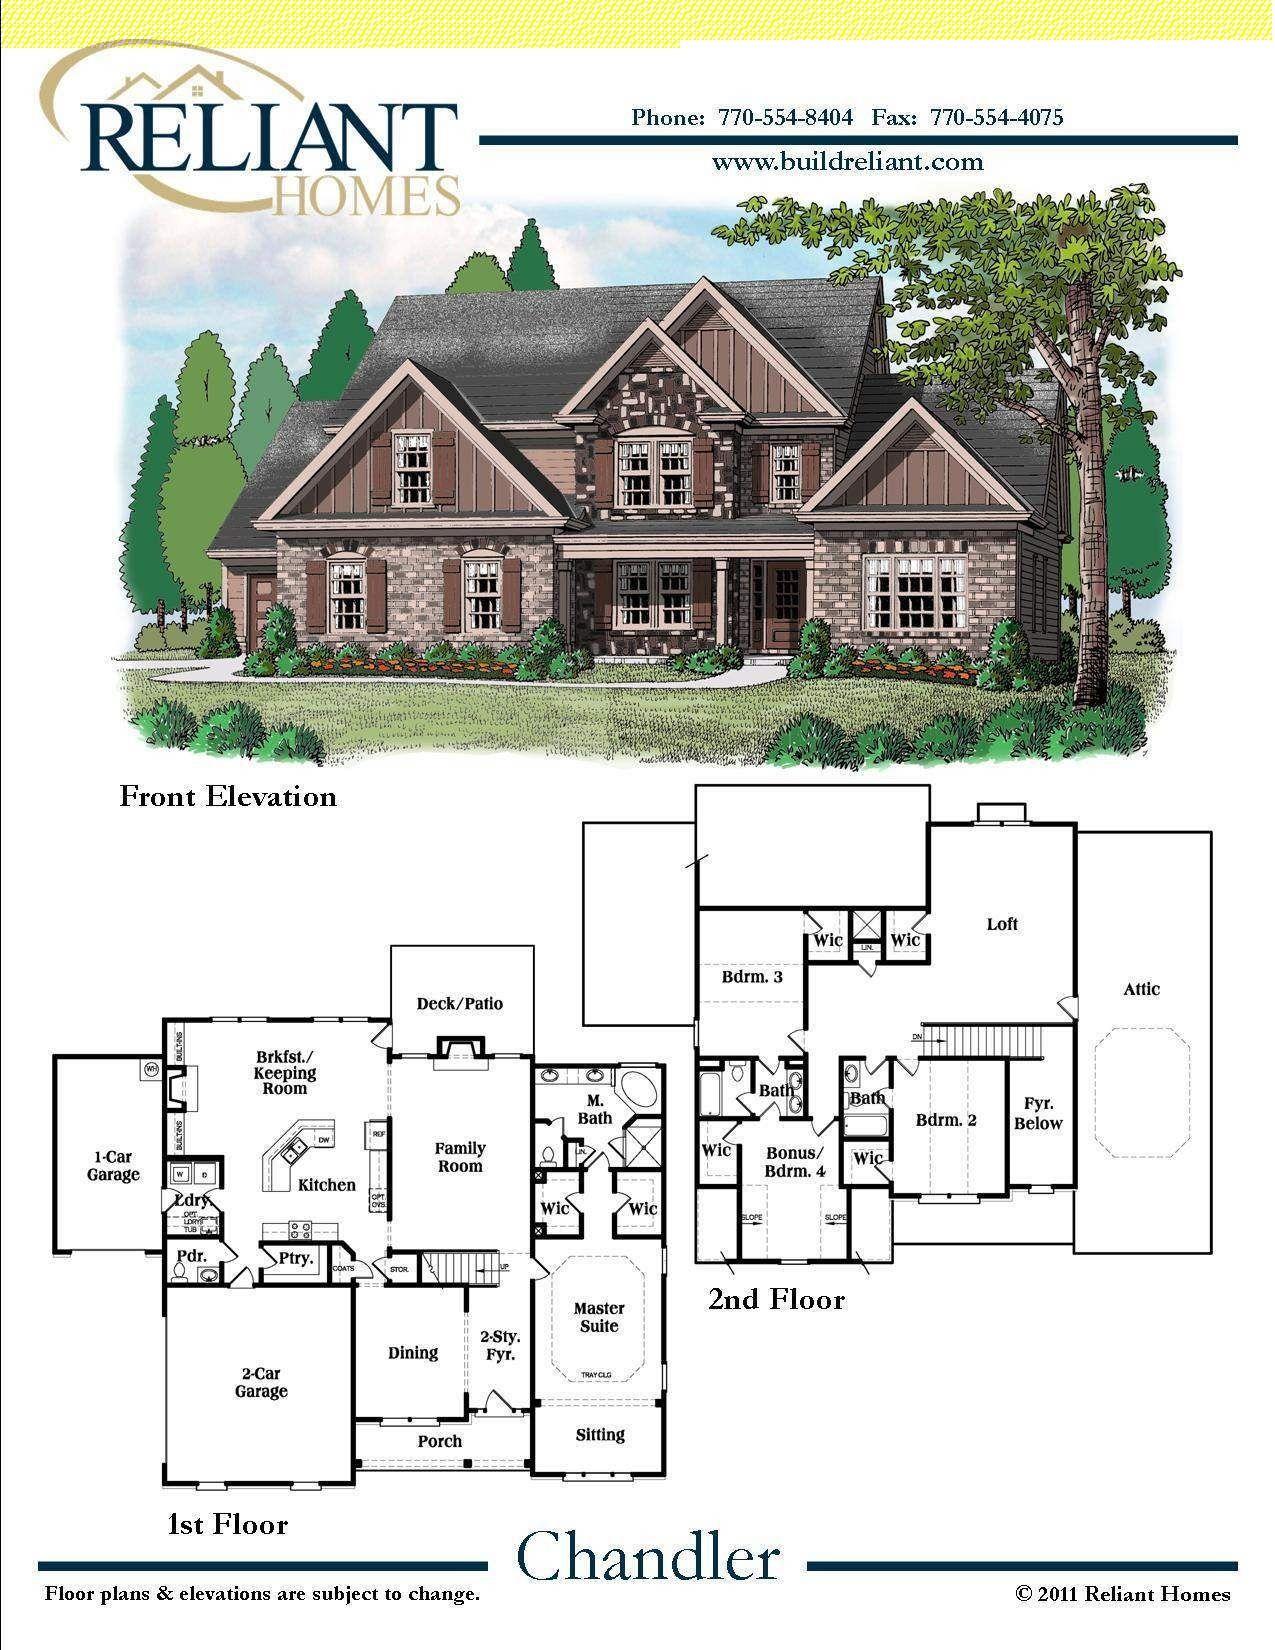 Reliant homes the chandler plan floor plans homes for Reliant homes floor plans